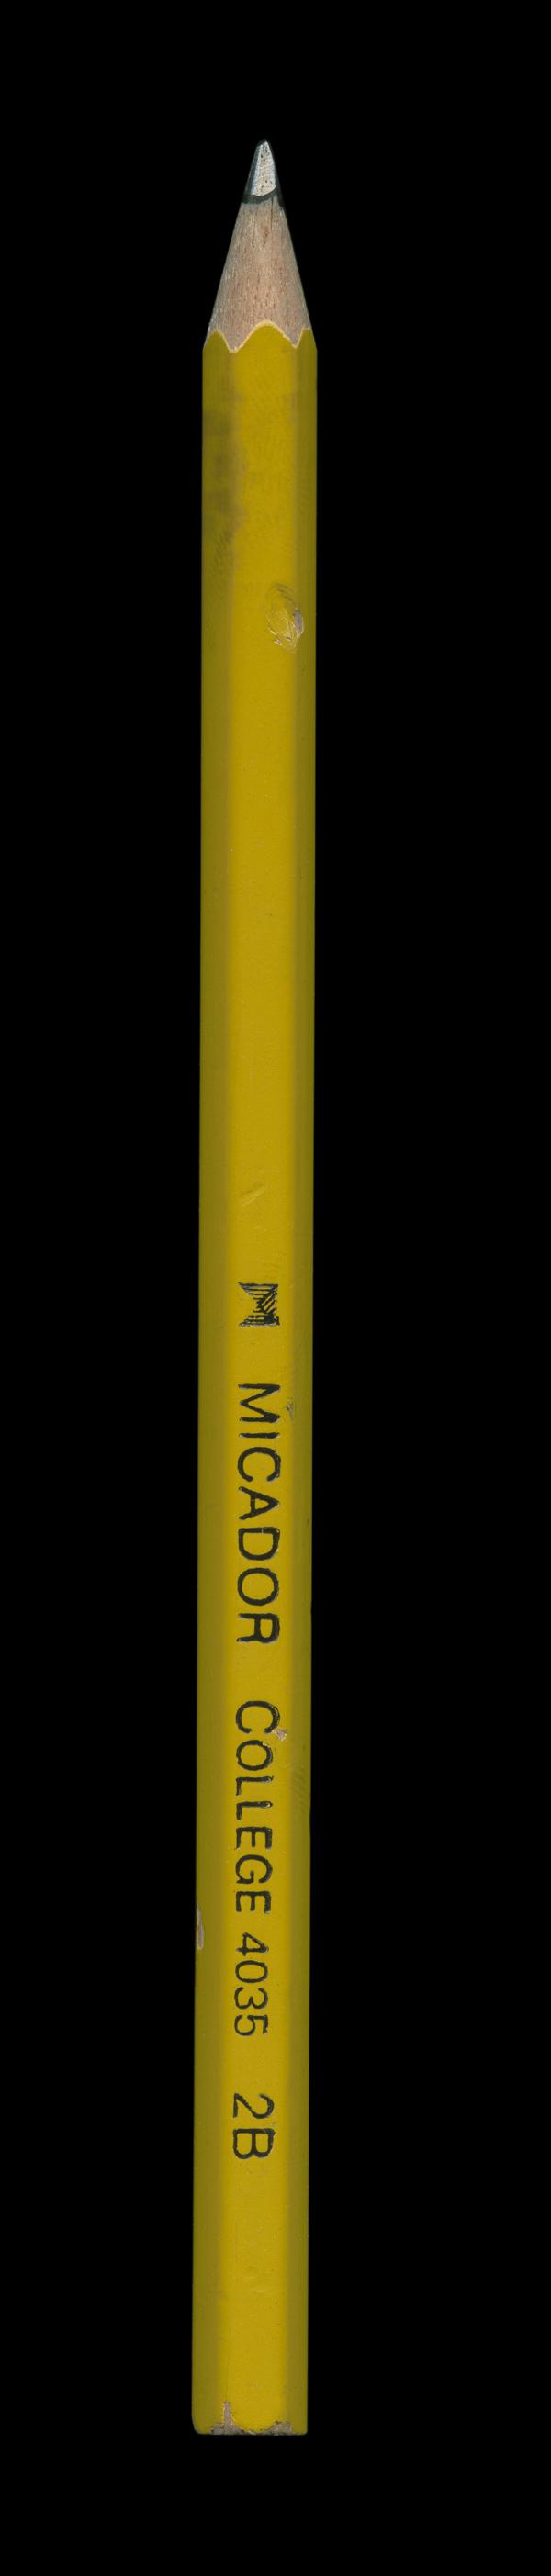 Heide pencil